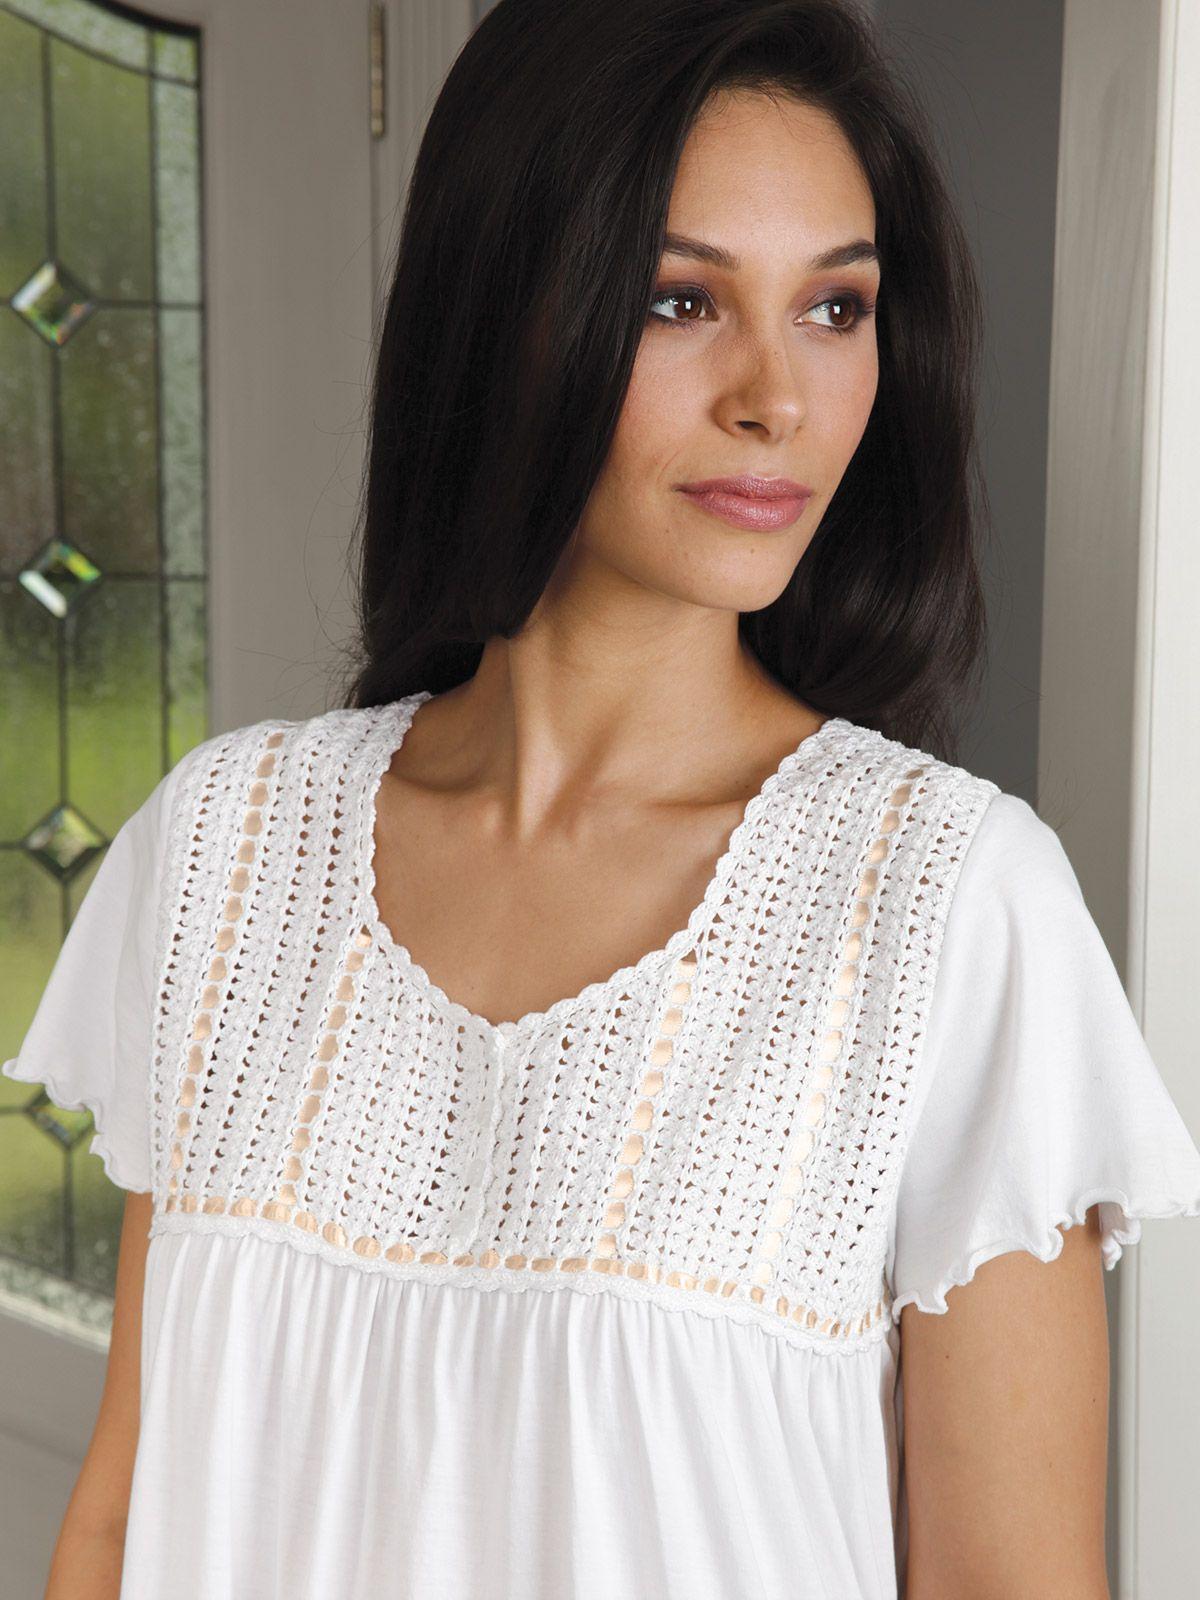 72f0a52bca Cotton Nighties, Luxury Nightwear, White Gowns, Night Gown, Anthropologie,  Crochet Top